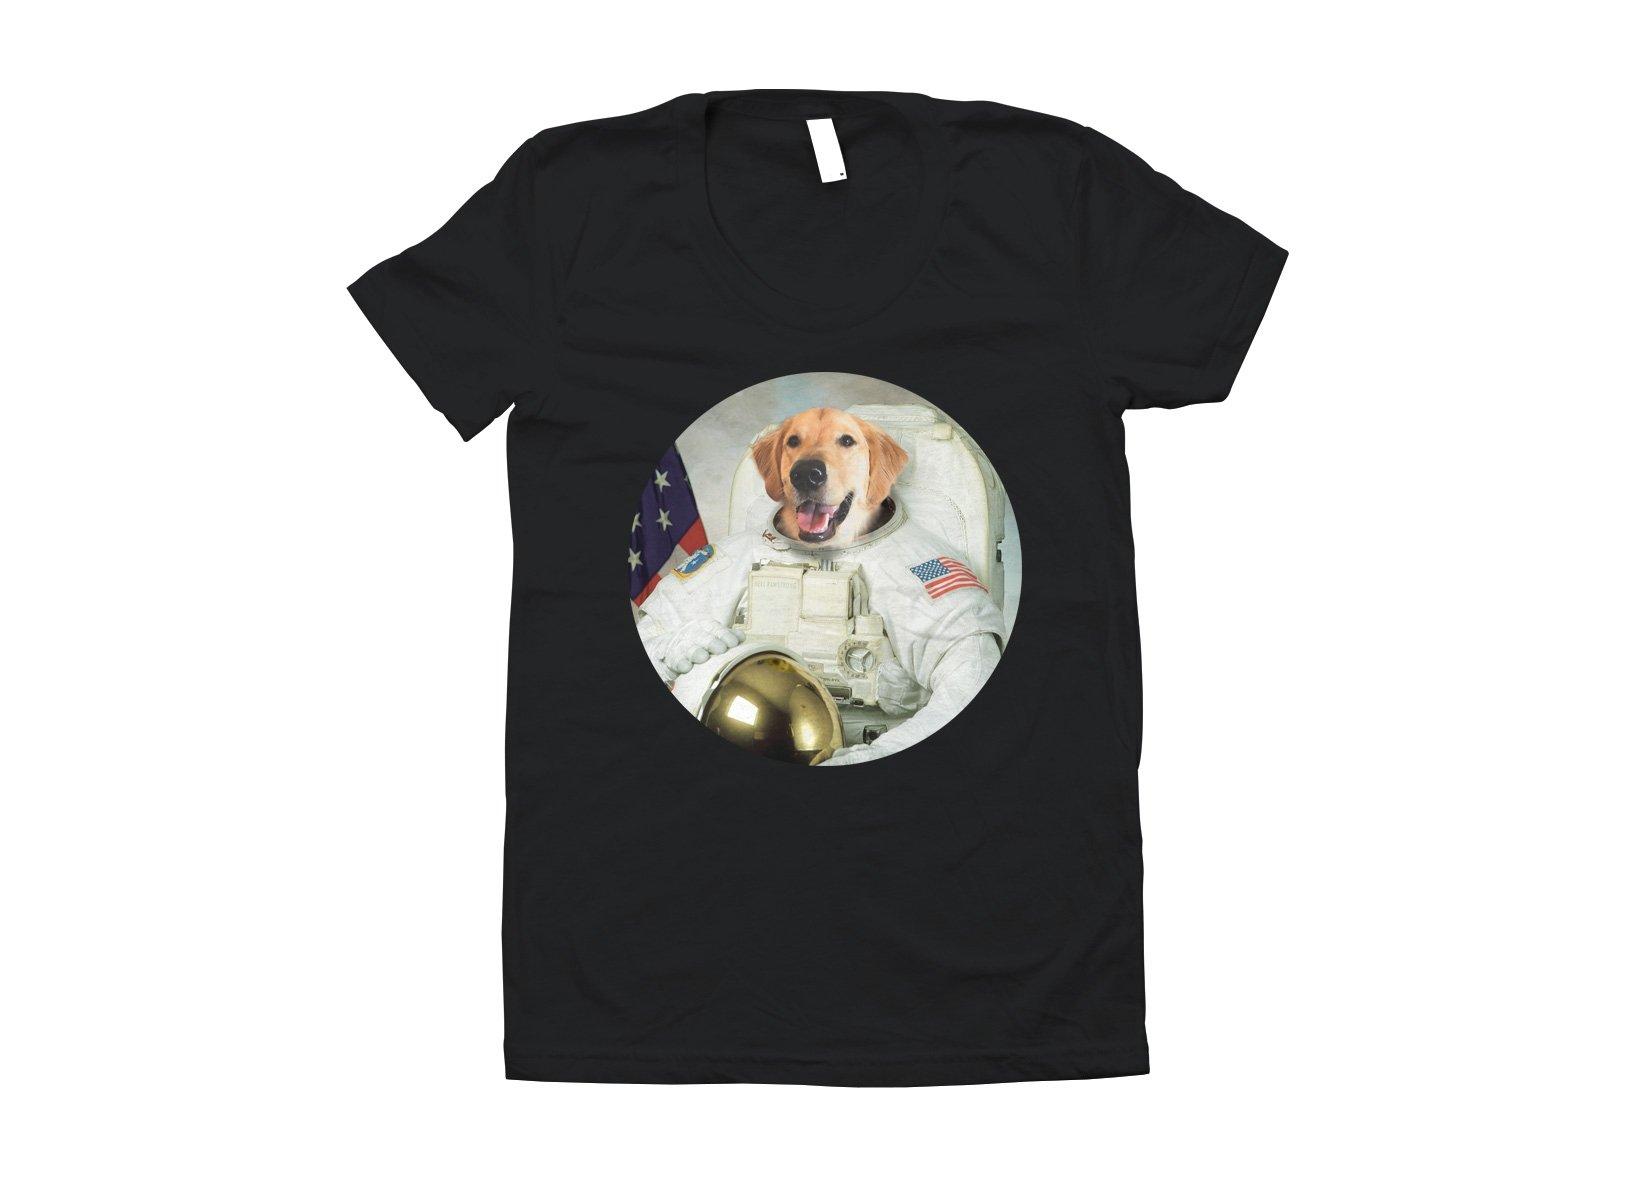 Astrodog on Juniors T-Shirt